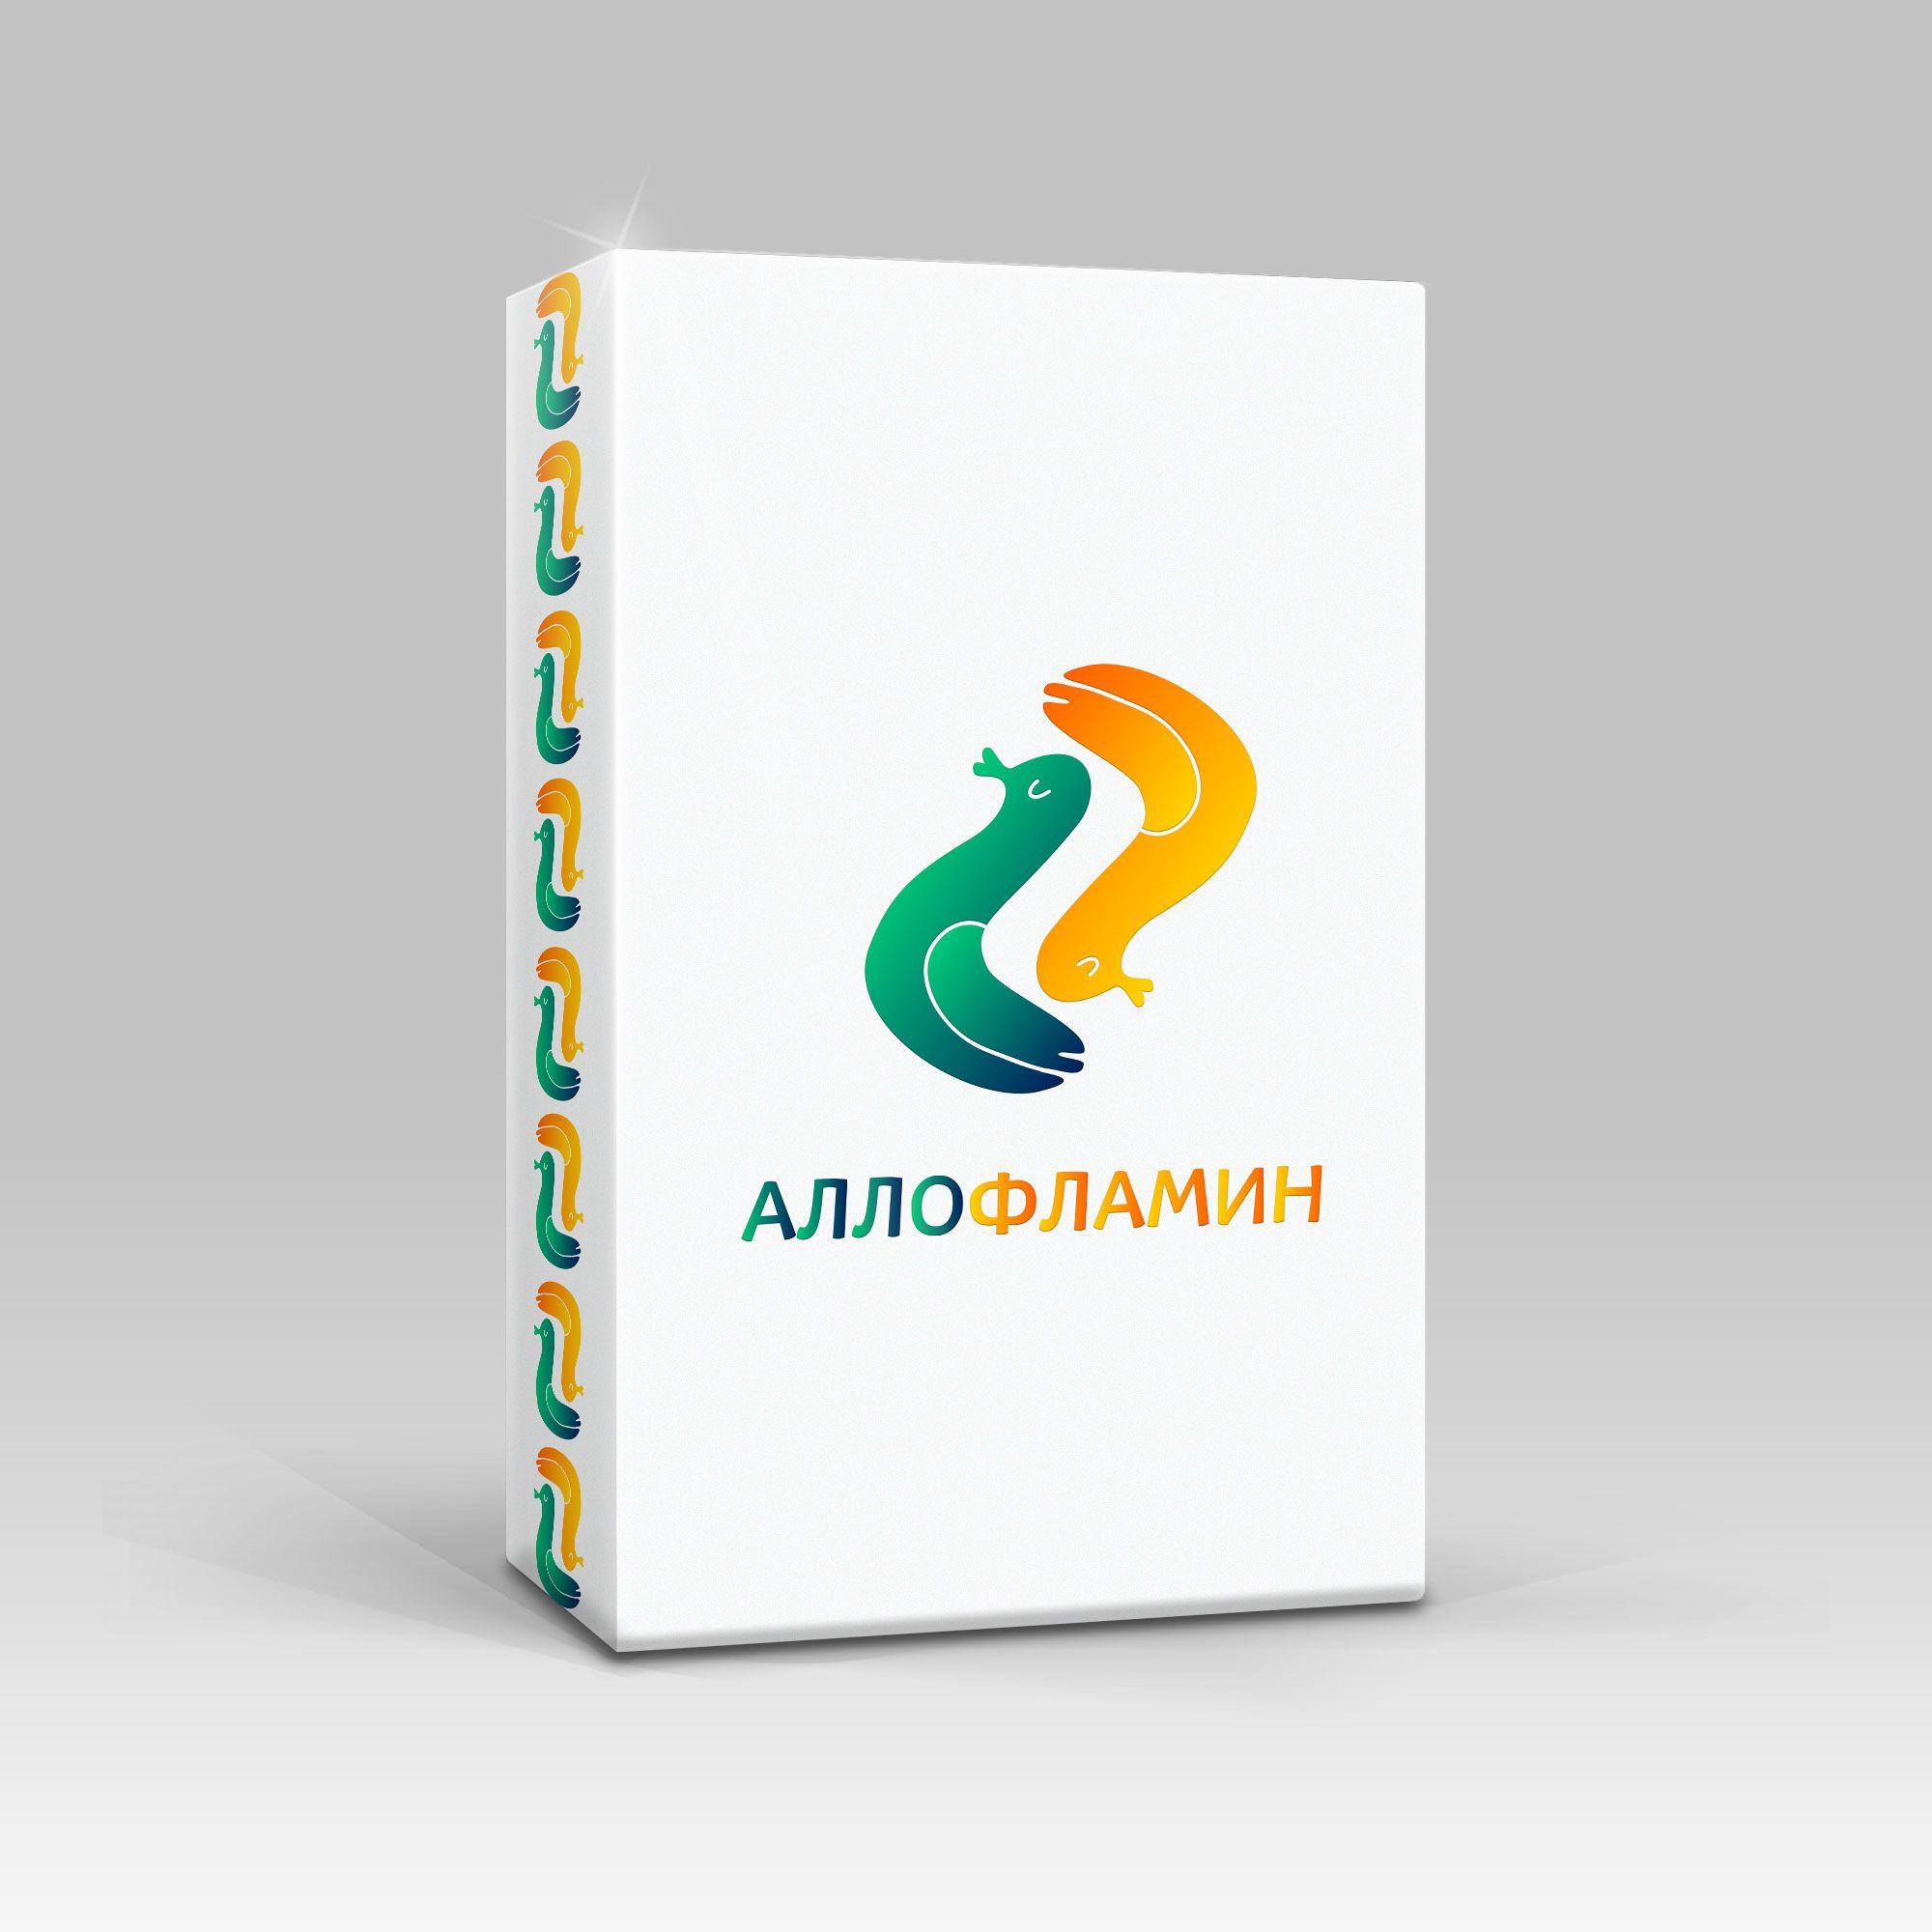 Логотип препарата Аллофламин - дизайнер TanOK1